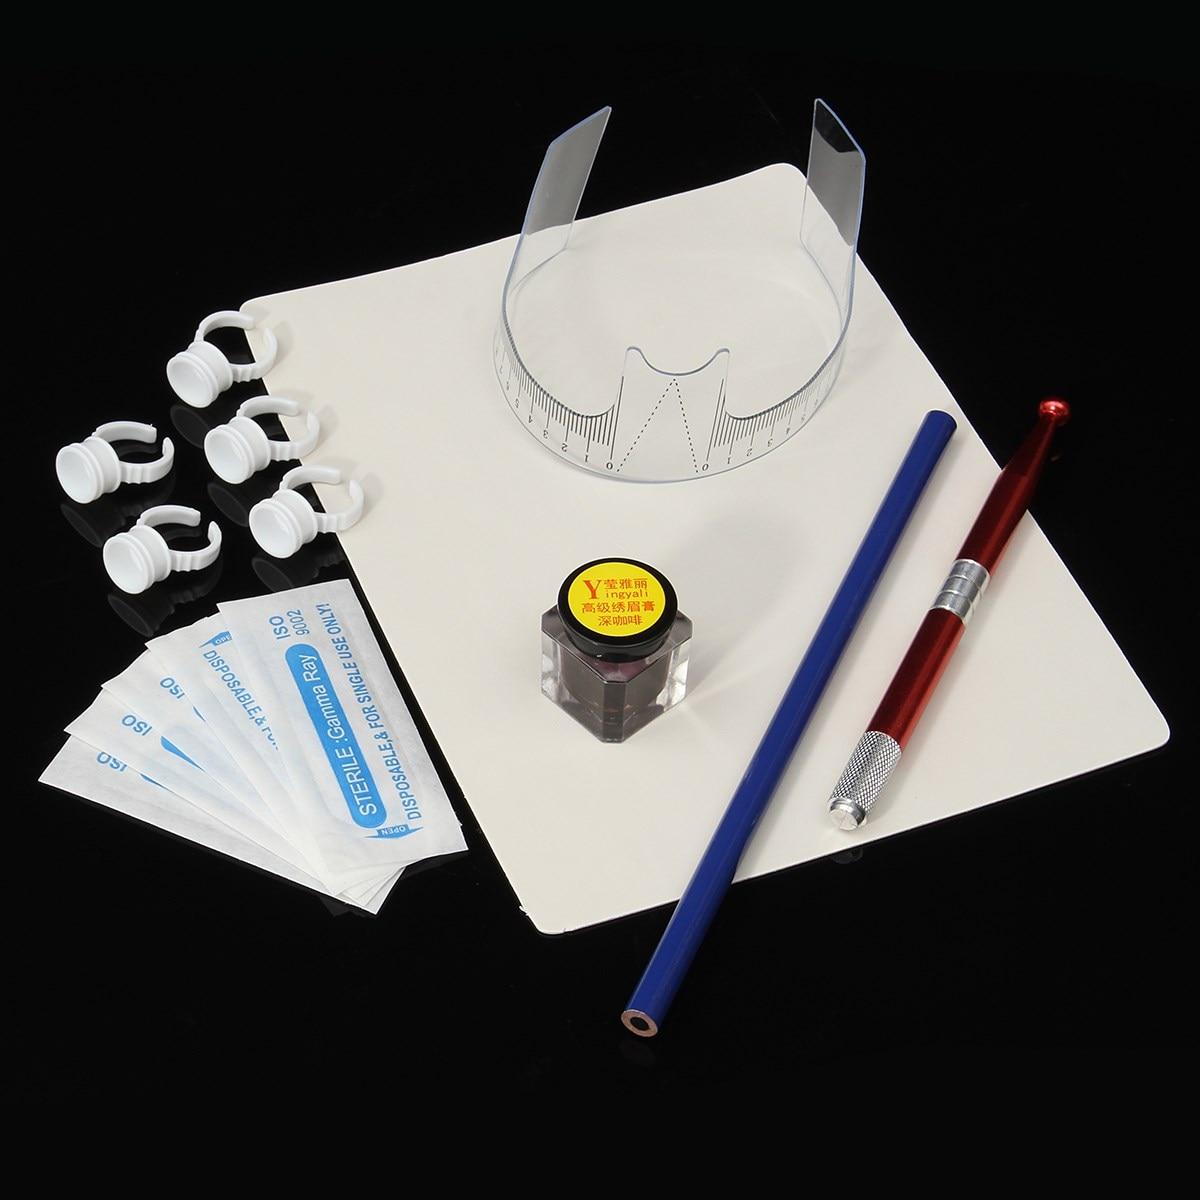 Professional Microblading Manual Tattoo Pen Pigment Needle Ring Ruler Practice Skin Kit Set Permanent Makeup 3D